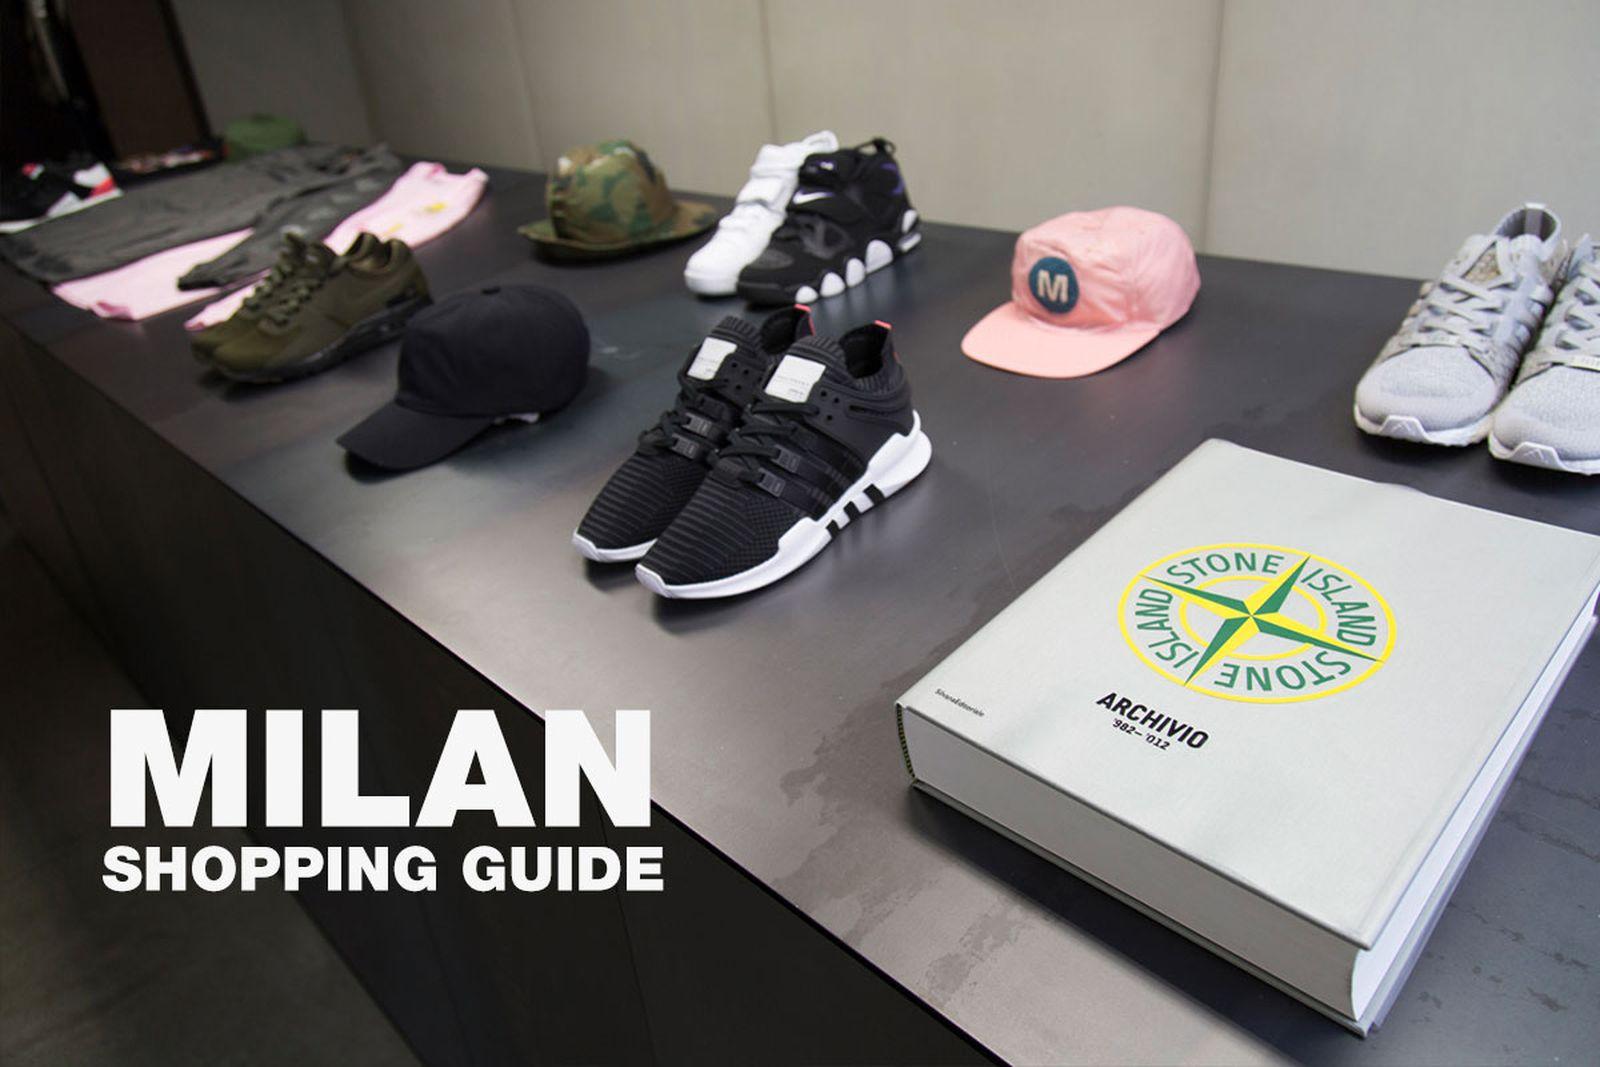 milan-shopping-guide-main